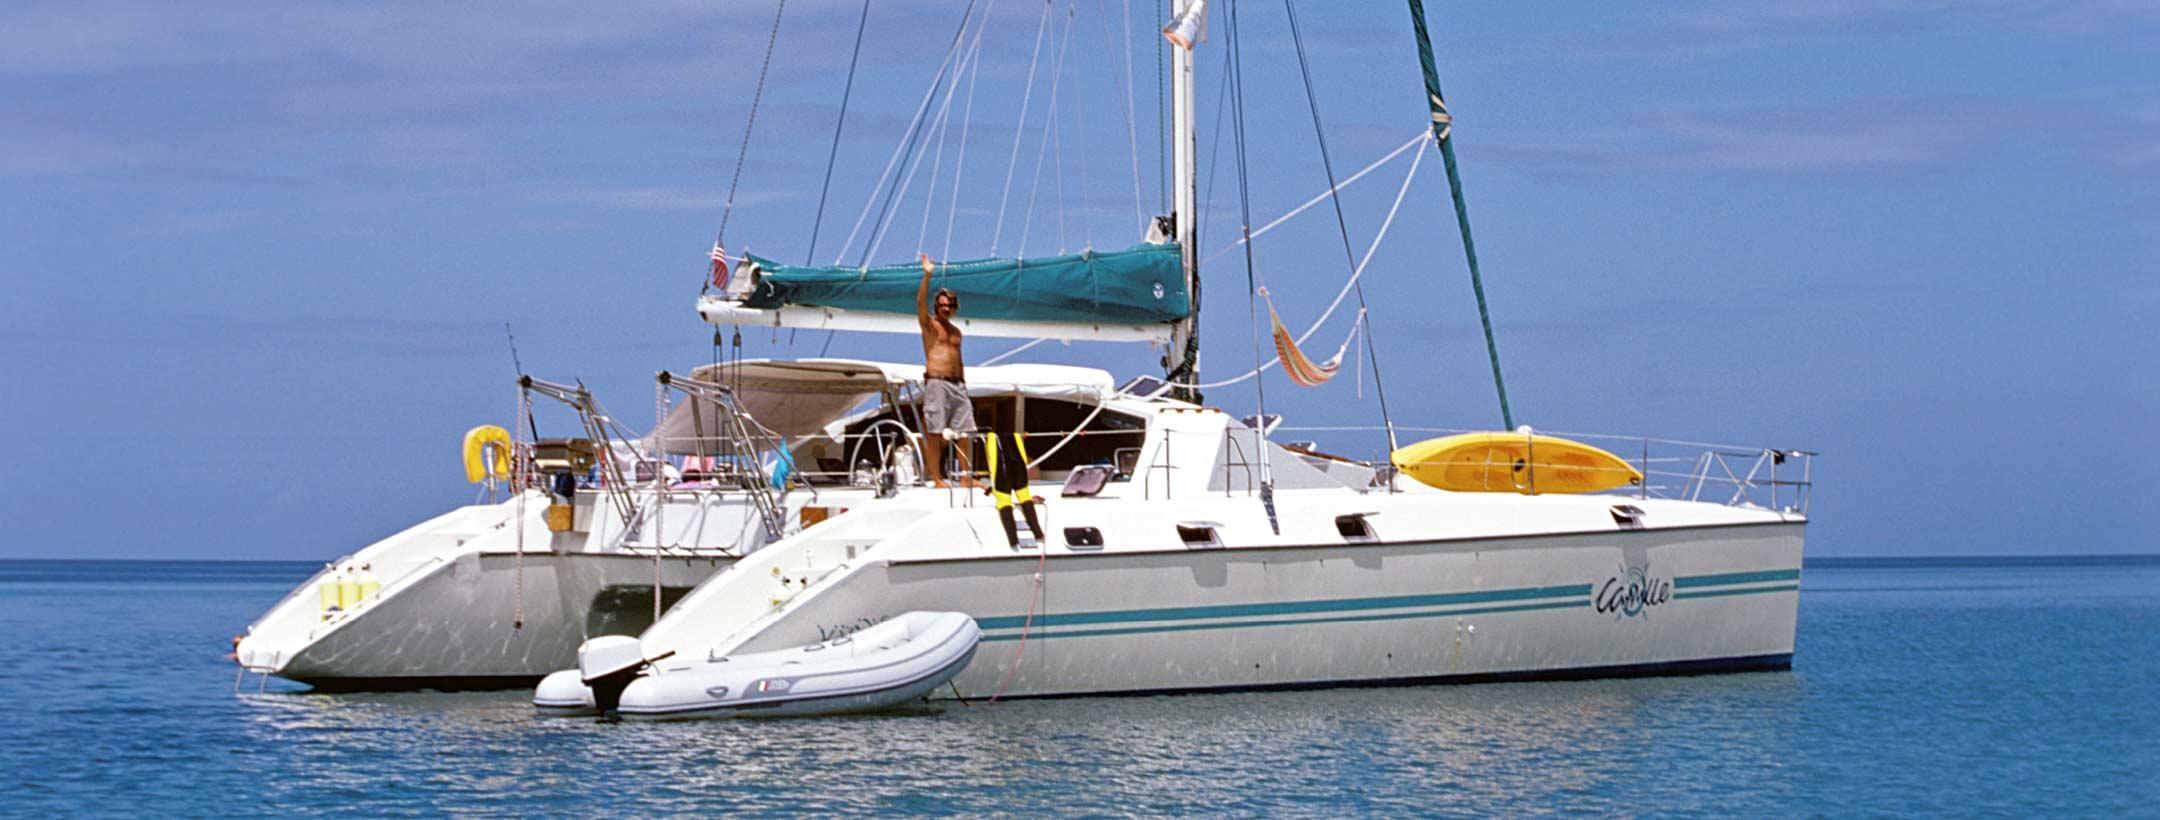 TradeWinds Privilege 51 Cruising Class Yacht